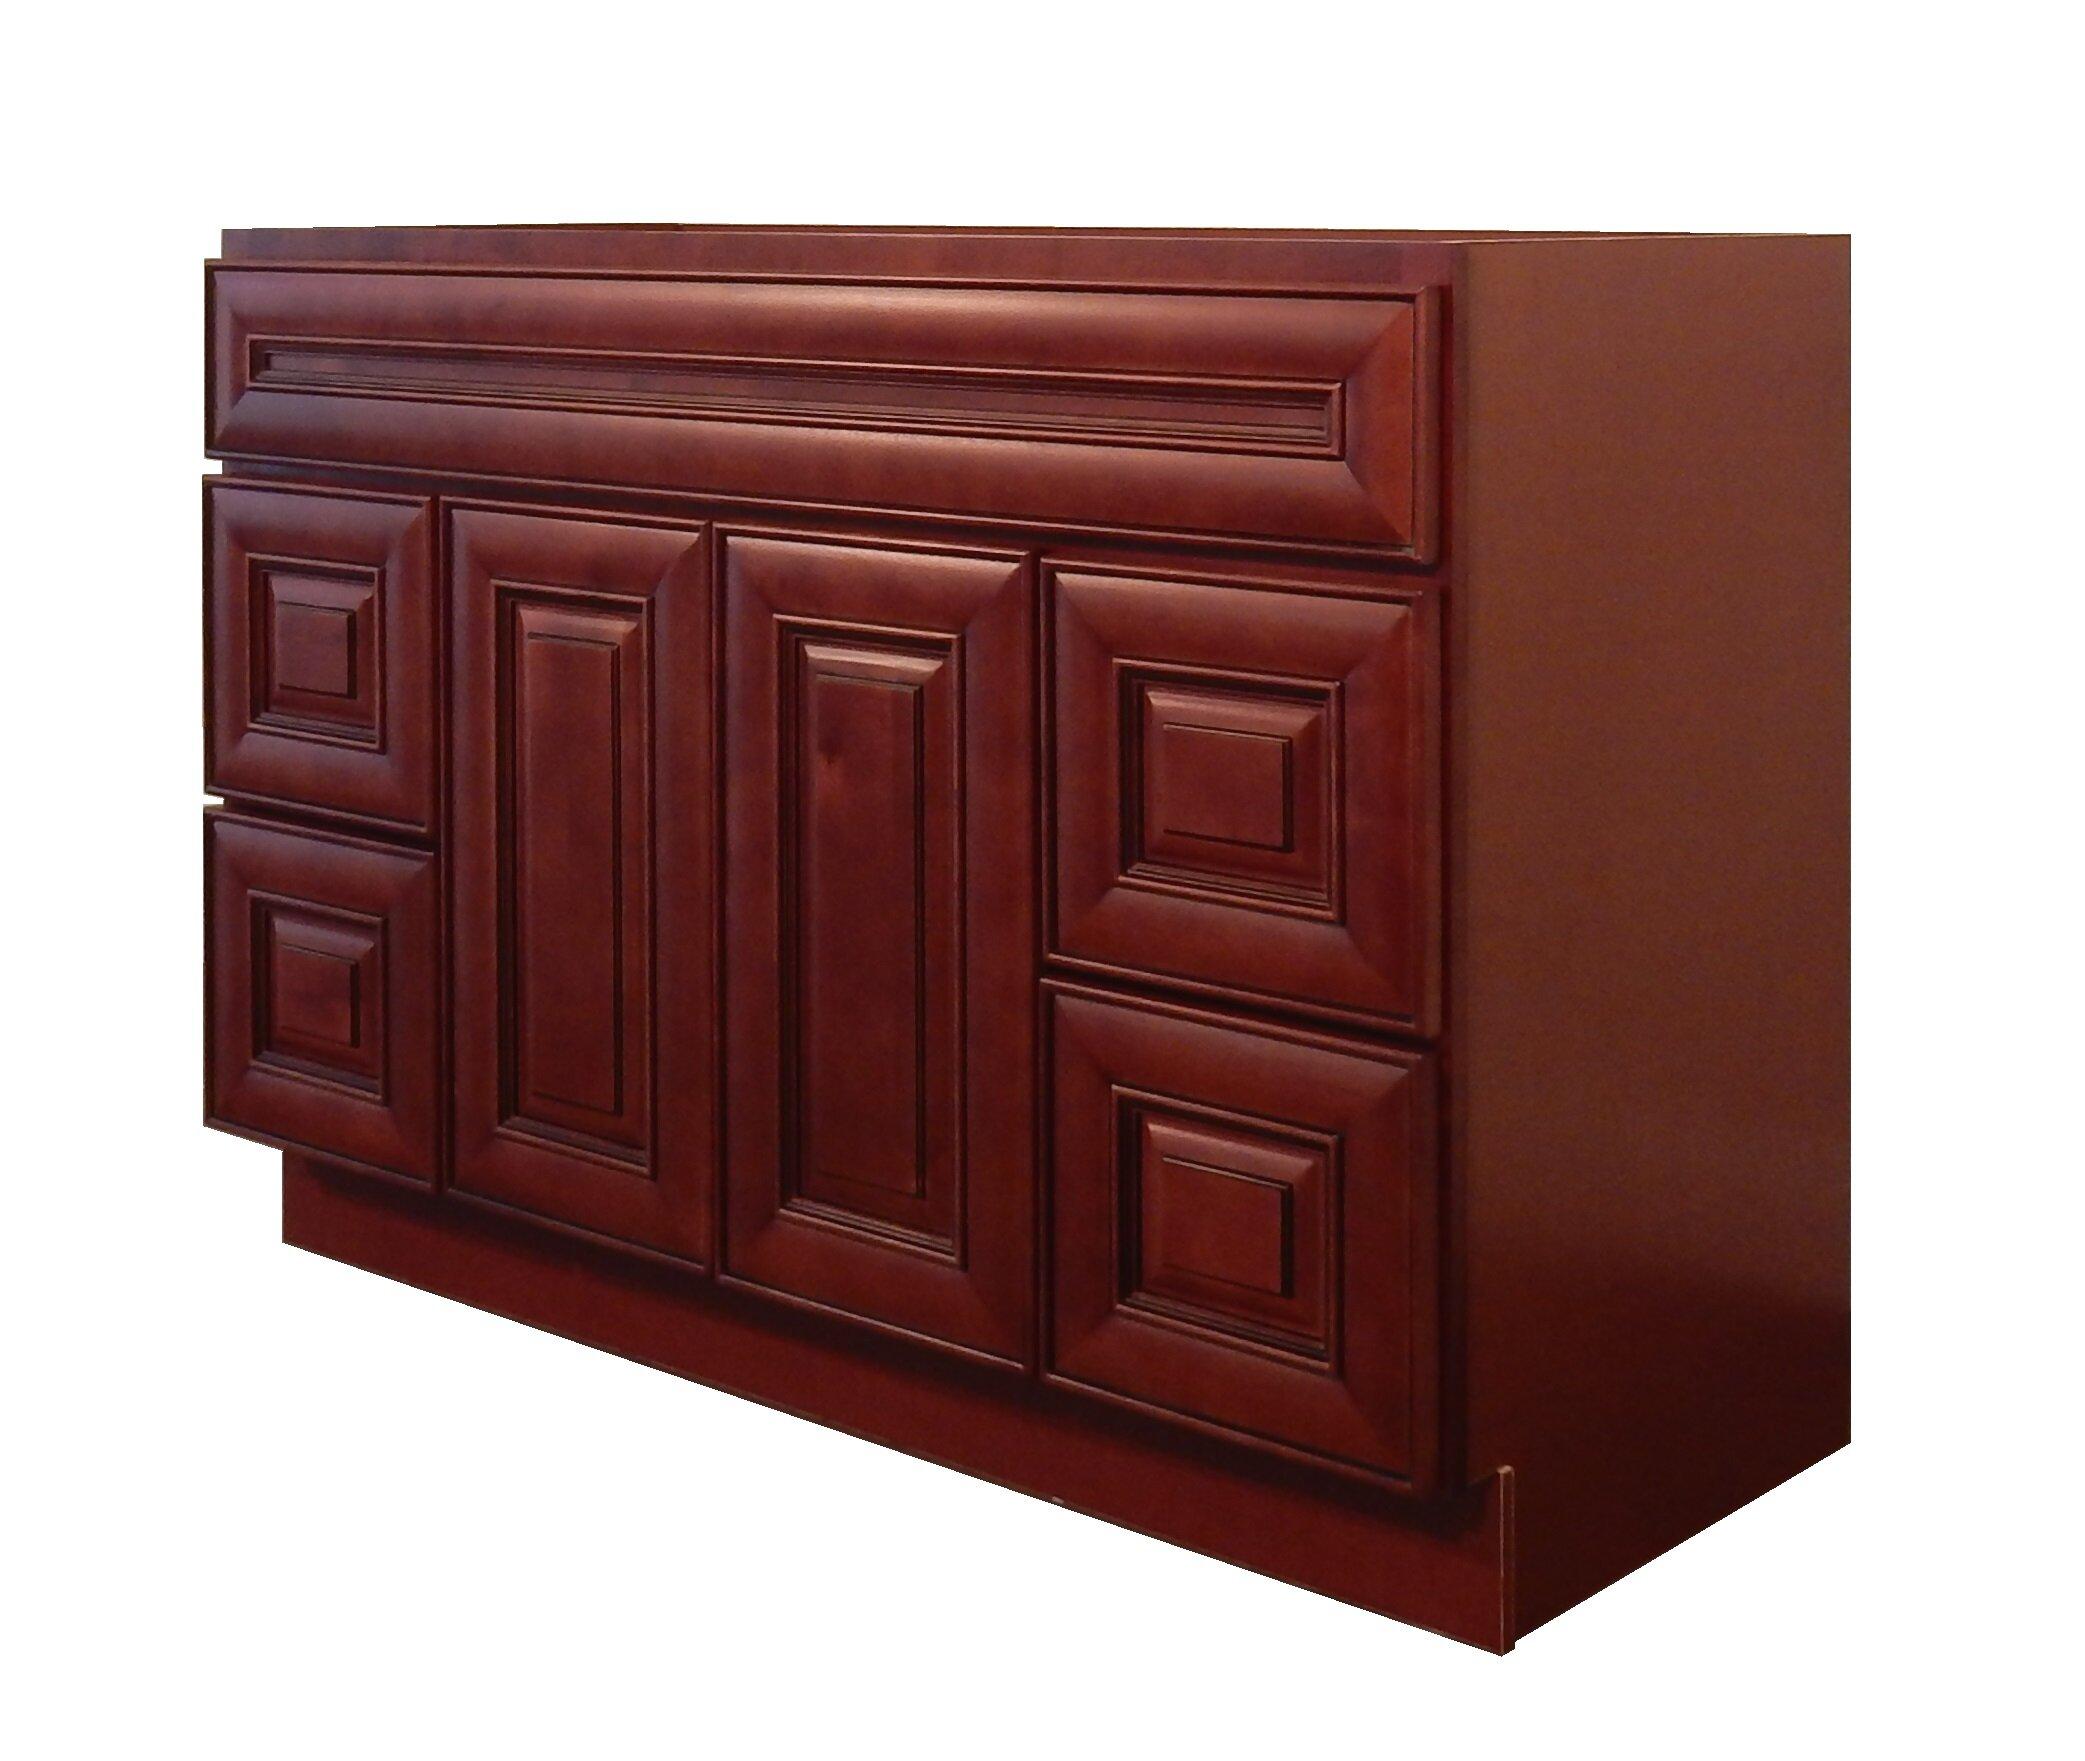 NGY Stone U0026 Cabinet Maple 60u201d Single Bathroom Vanity Base | Wayfair